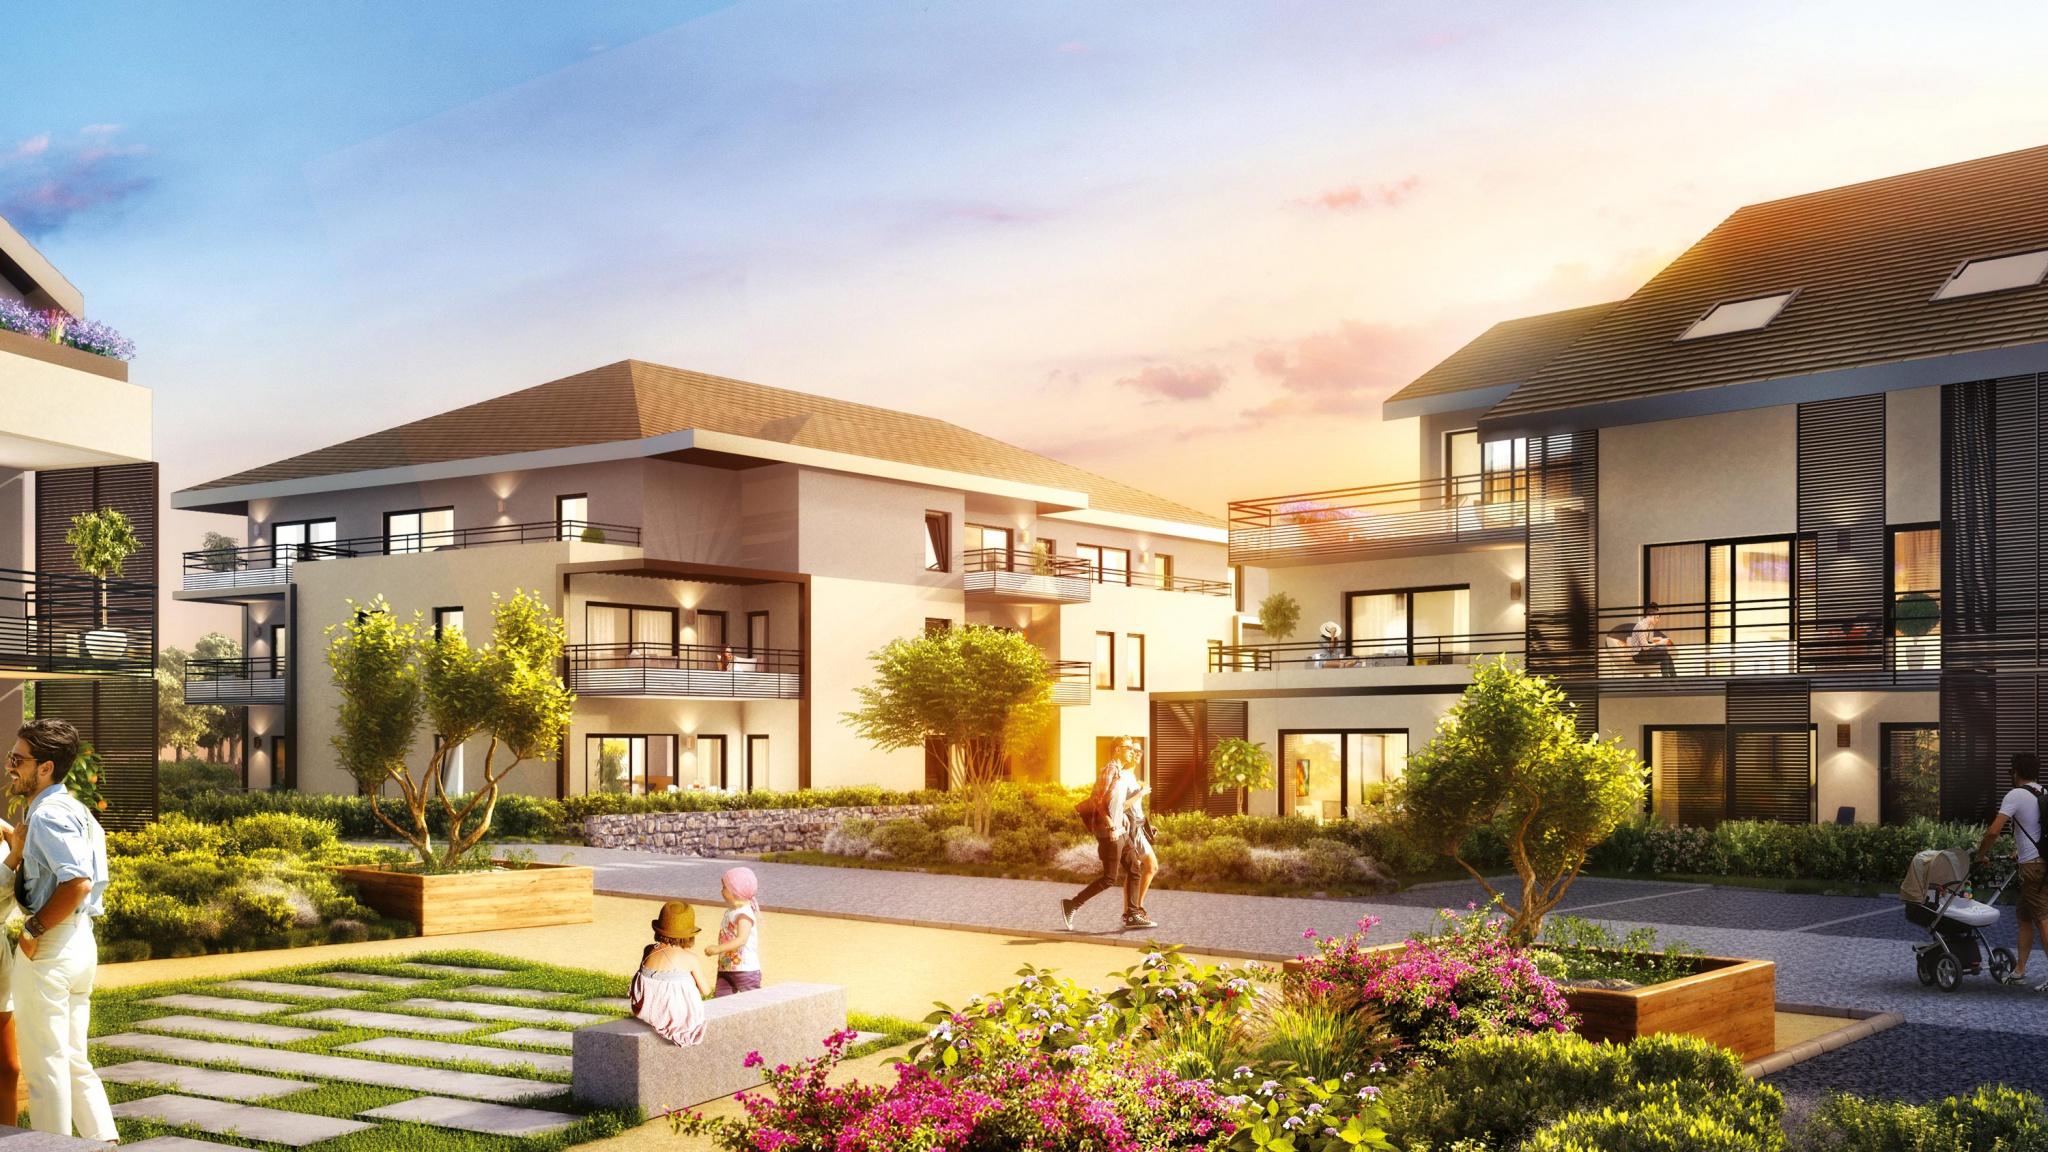 Vente immobilier neuf à Ornex